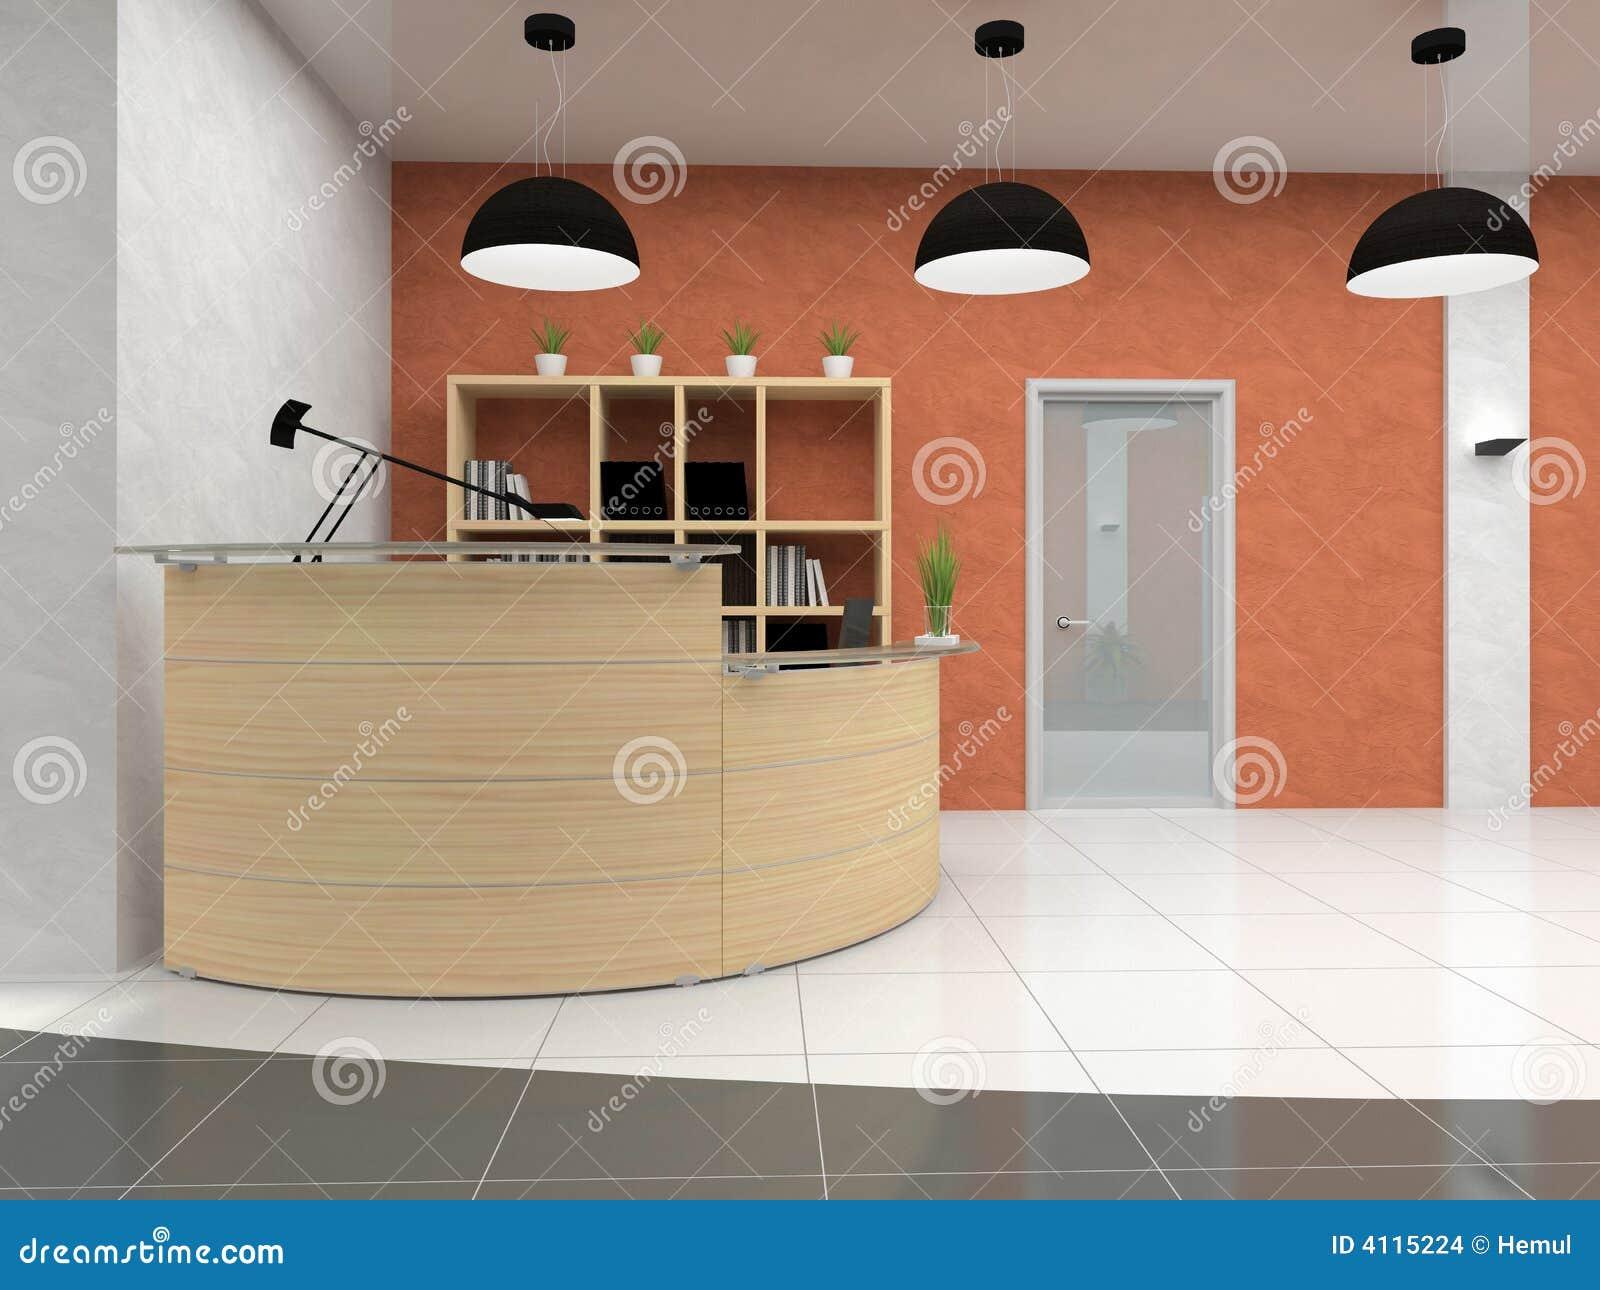 Comptoir de reception usage a vendre: comptoir de reception usage a